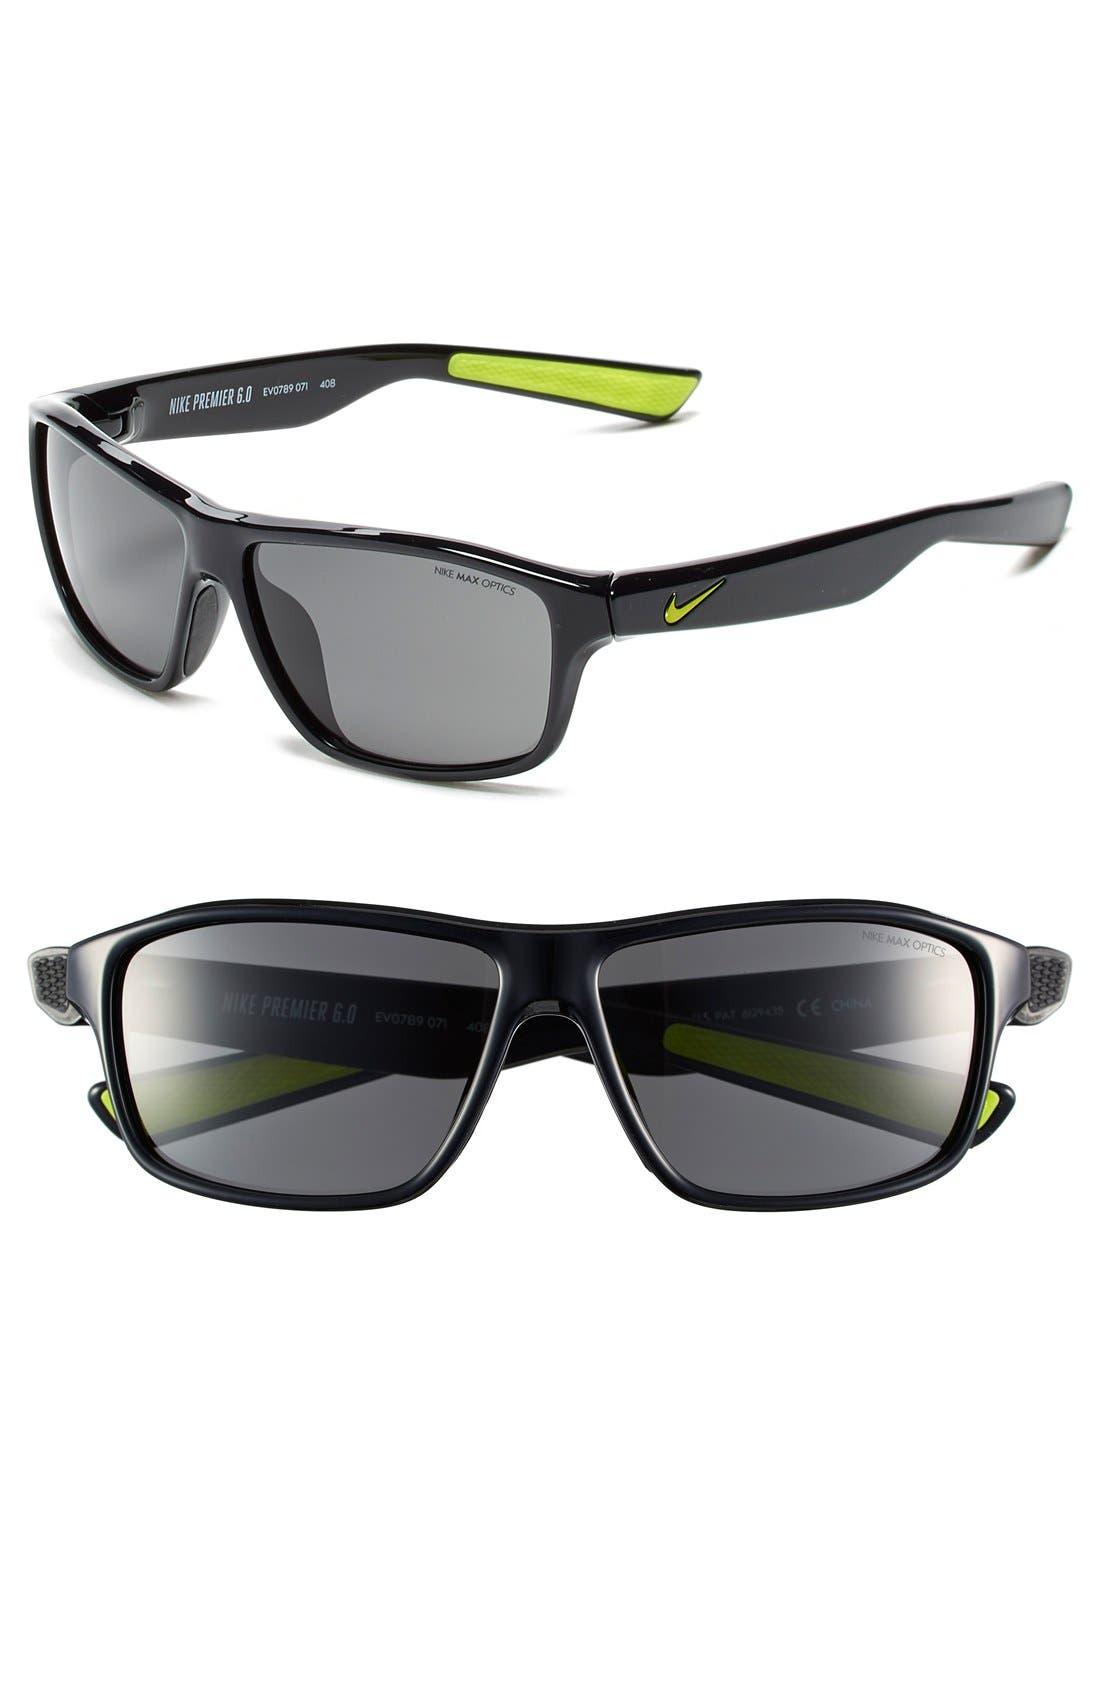 Nike 59mm 'Premier 6.0' Performance Sunglasses